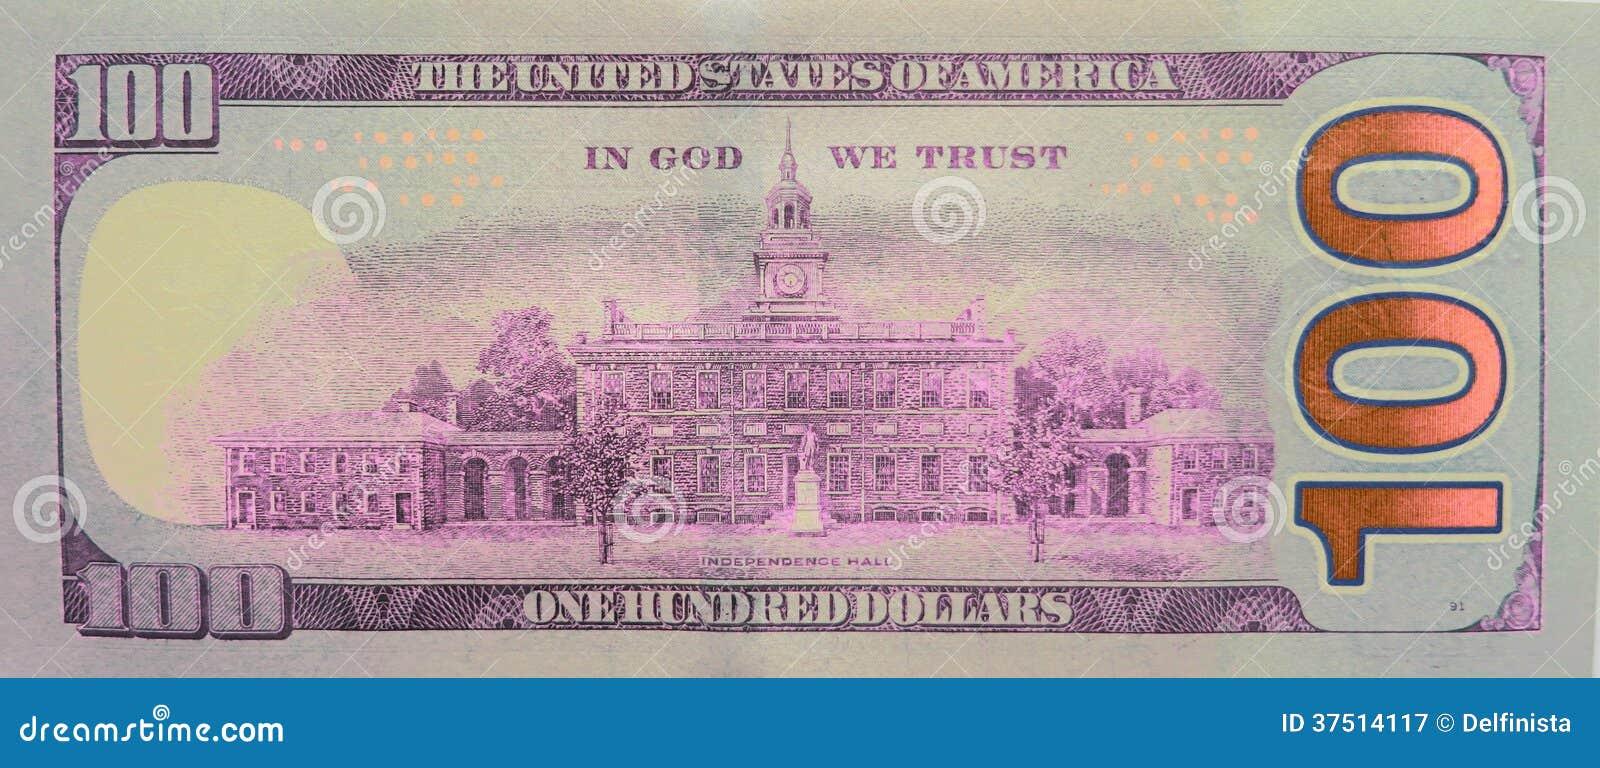 One Hundred Dollars 100 Dollar Bill Stock Photos Royalty Free Stock Photography Image 37514117